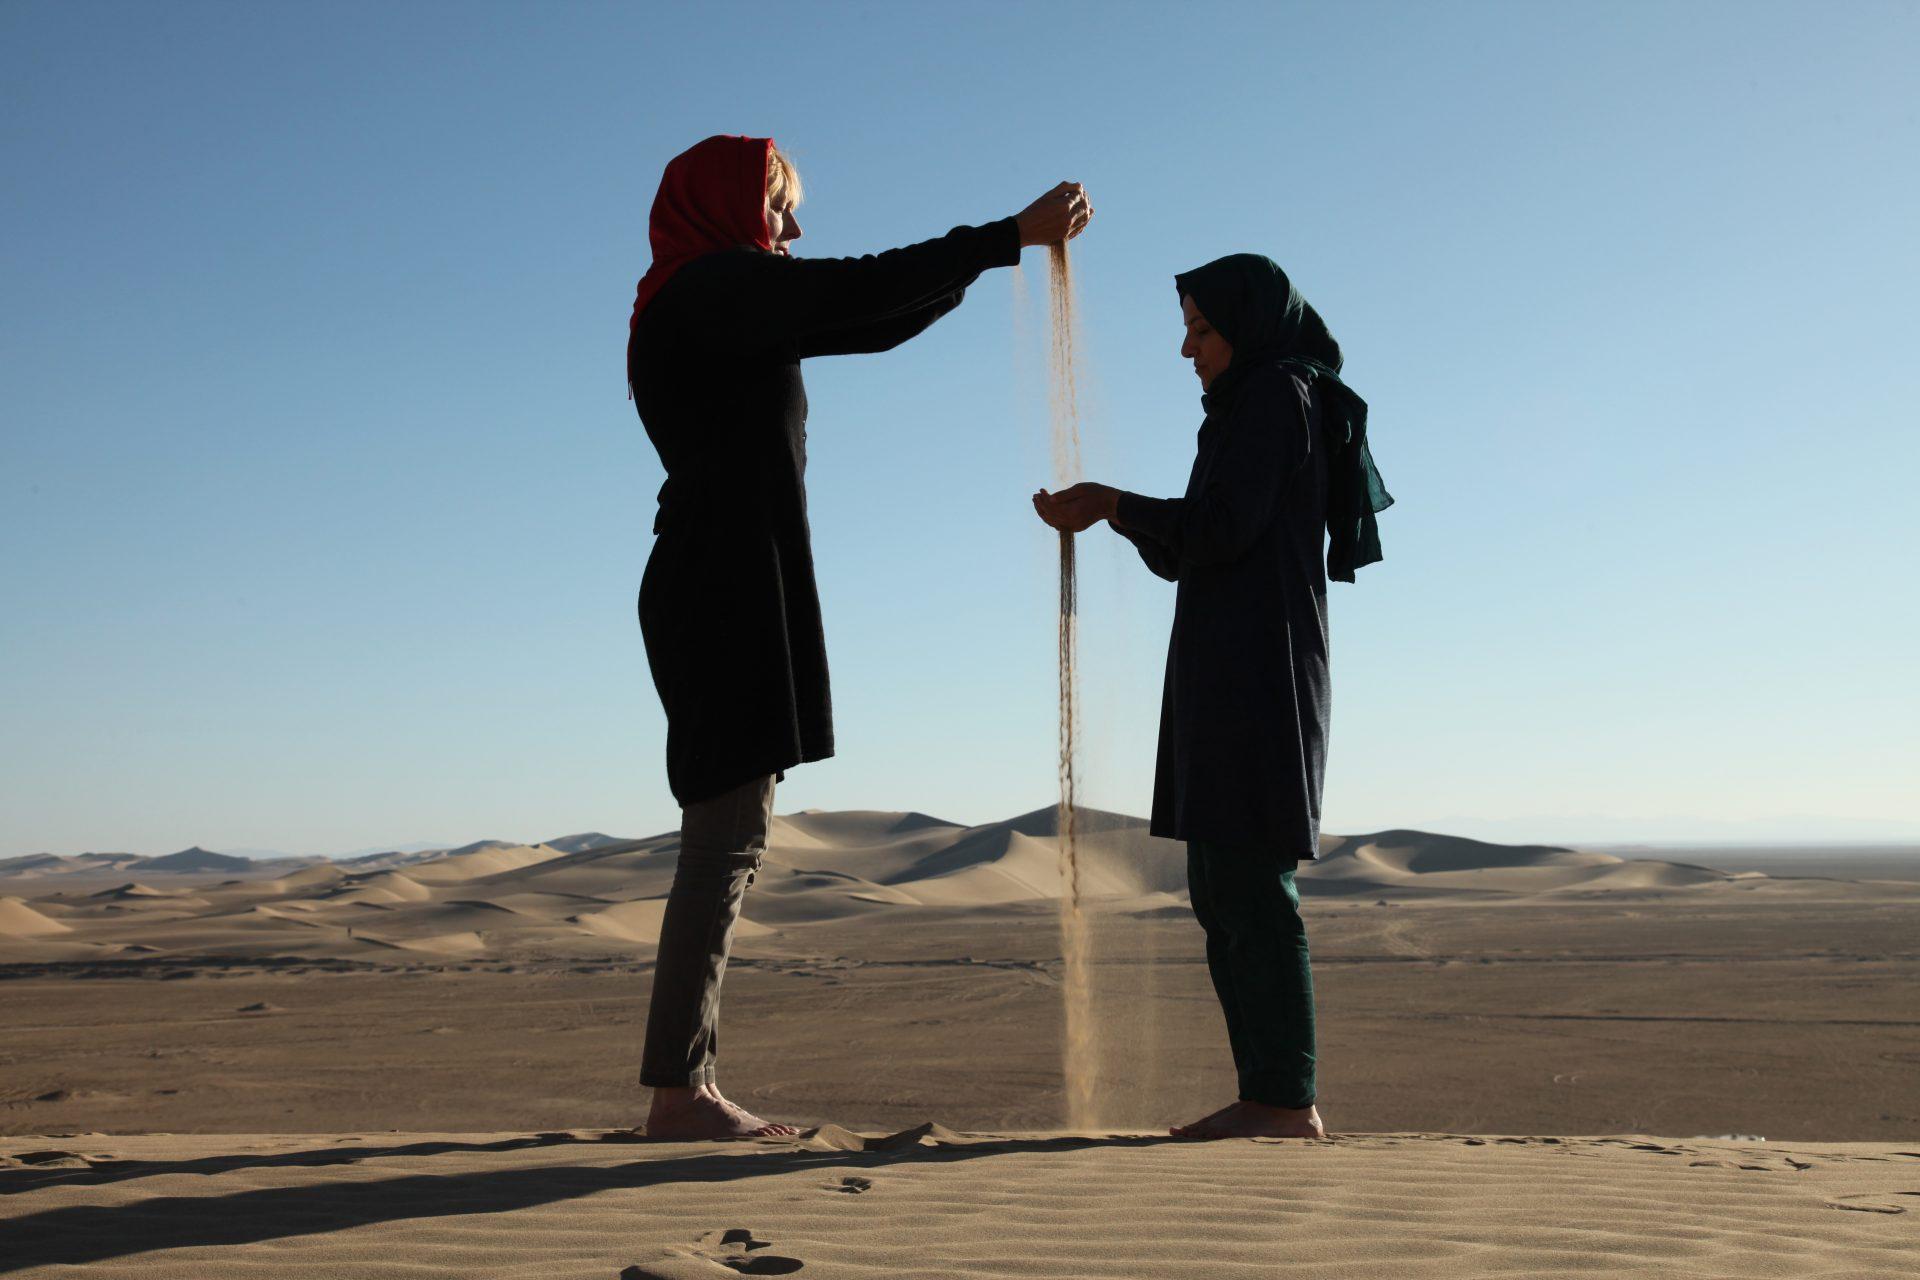 Gift-TaraGoudarzi-KarinvanderMolen-collaboration-Shahrnaz Zarkesh-Khara-desert-2016